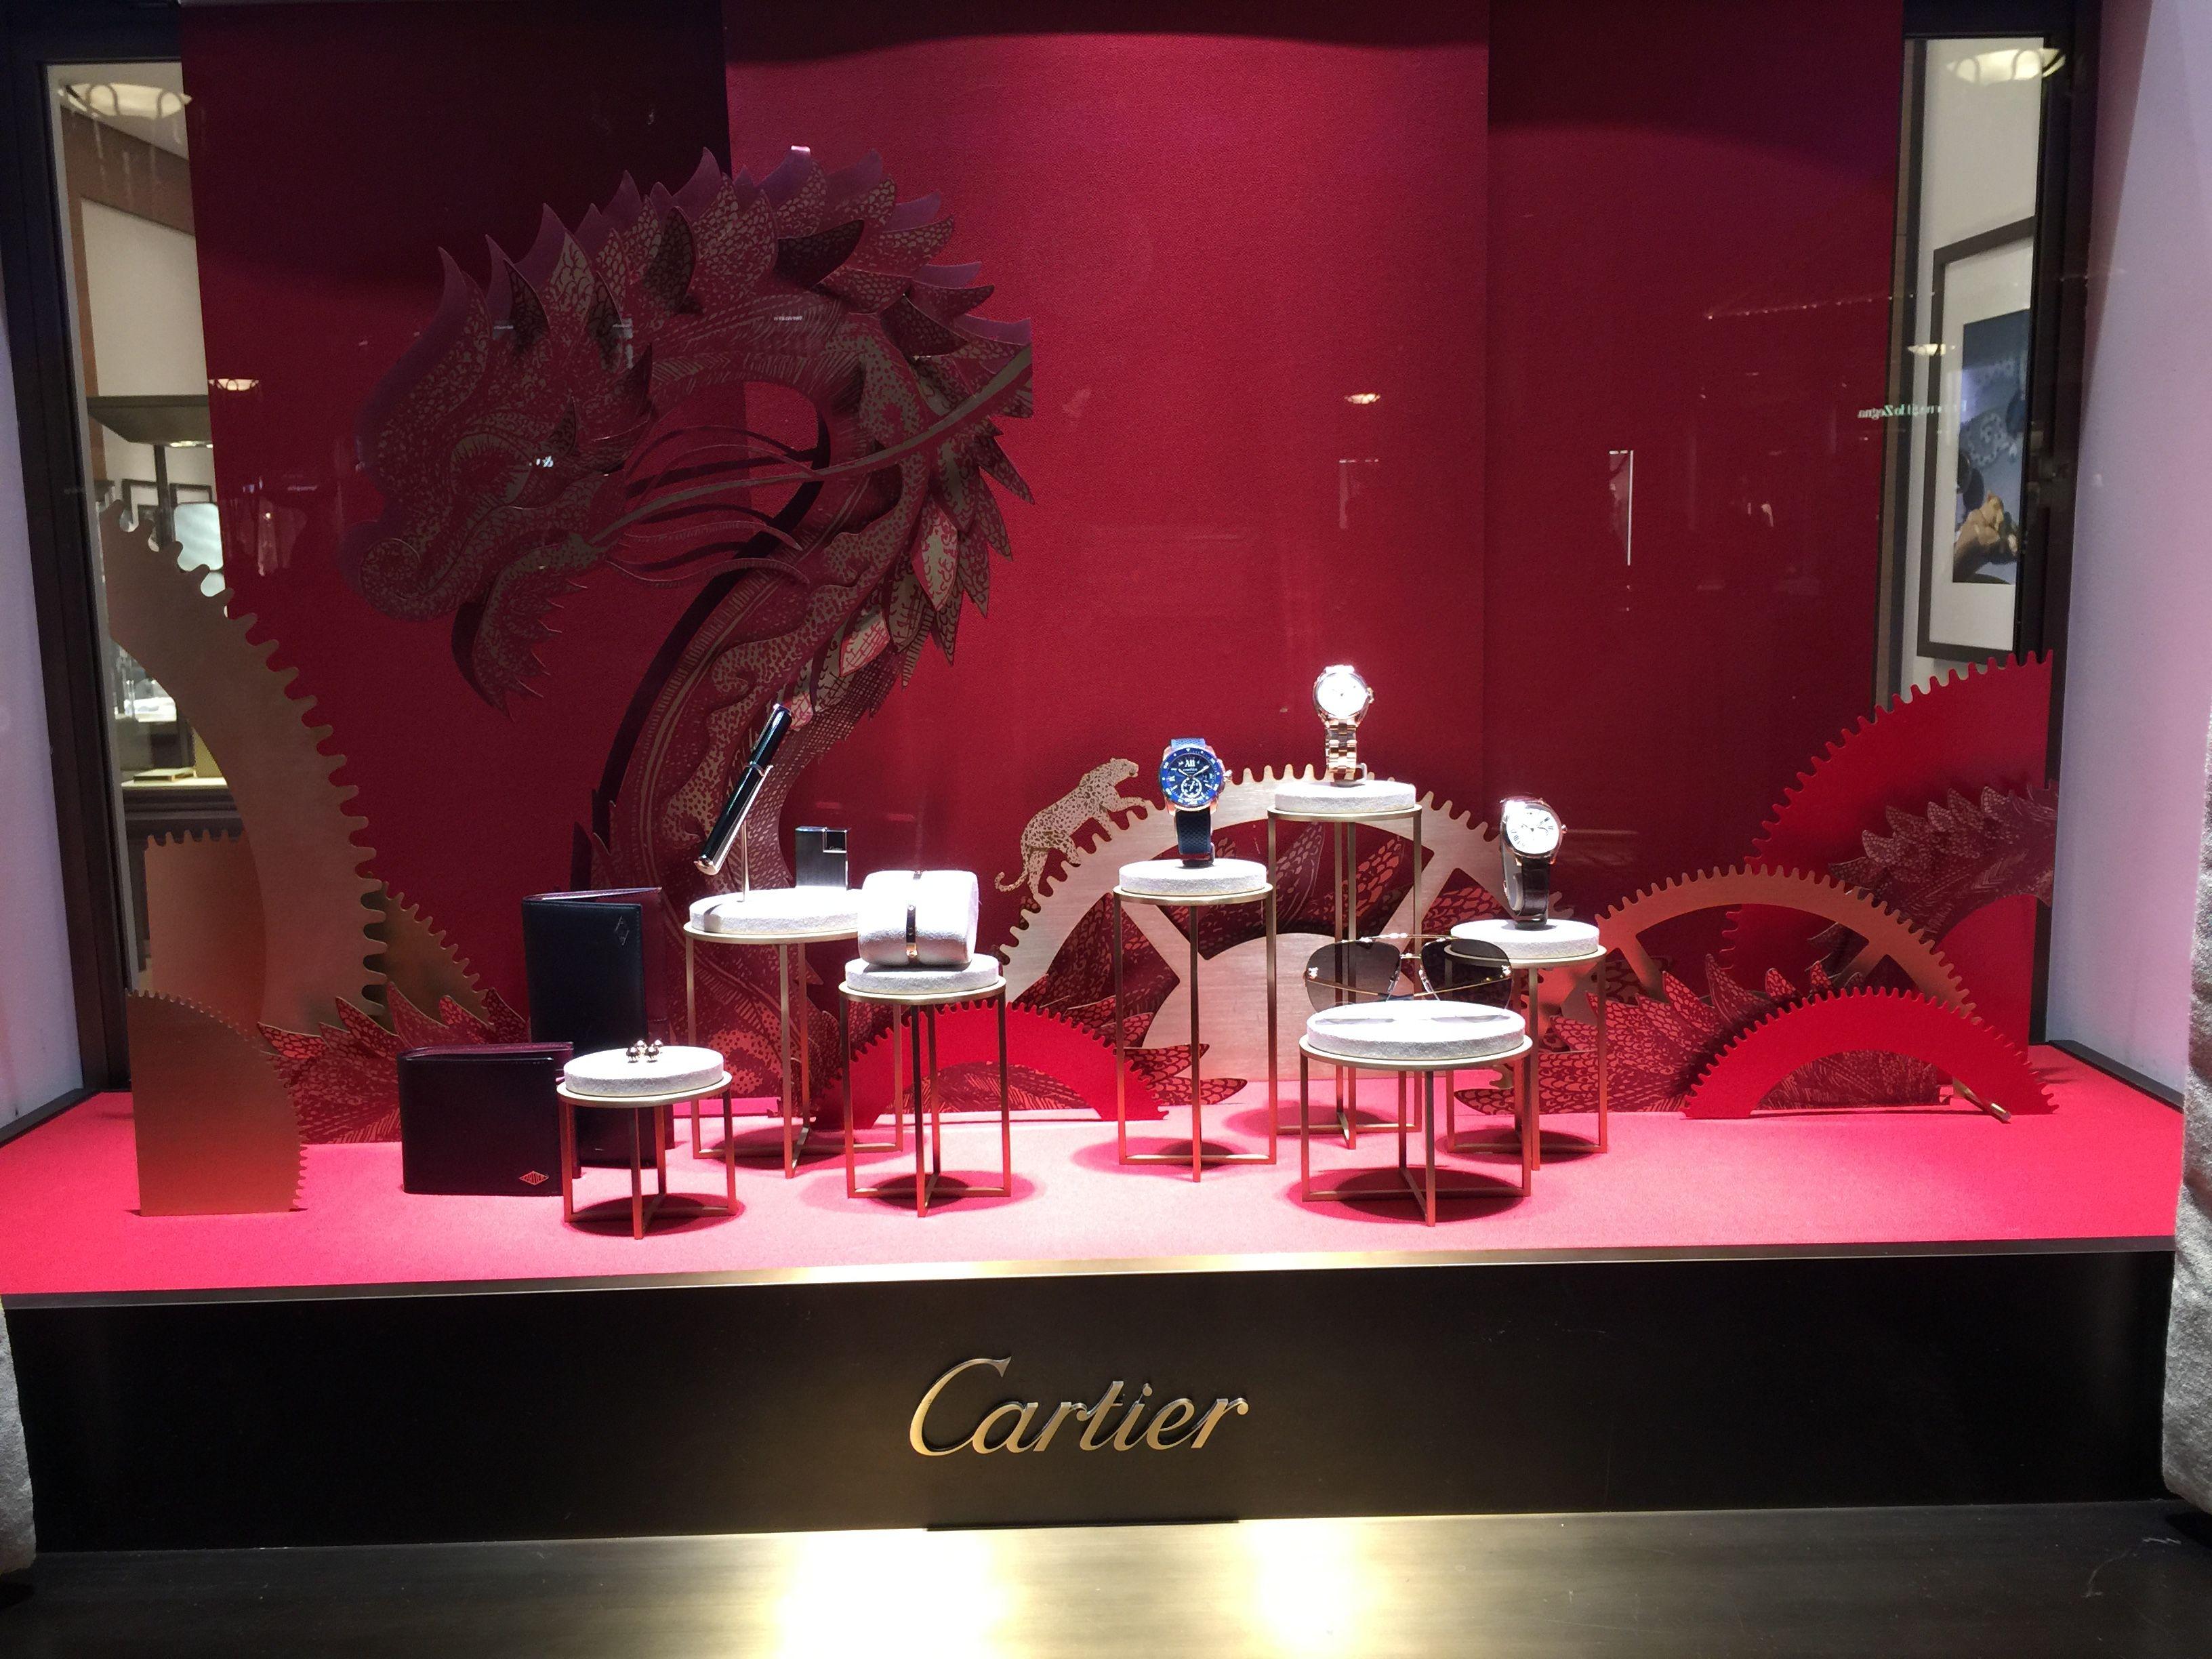 Window display ideas for jewellery  pin by wen bonfiglio on jewelry displays  pinterest